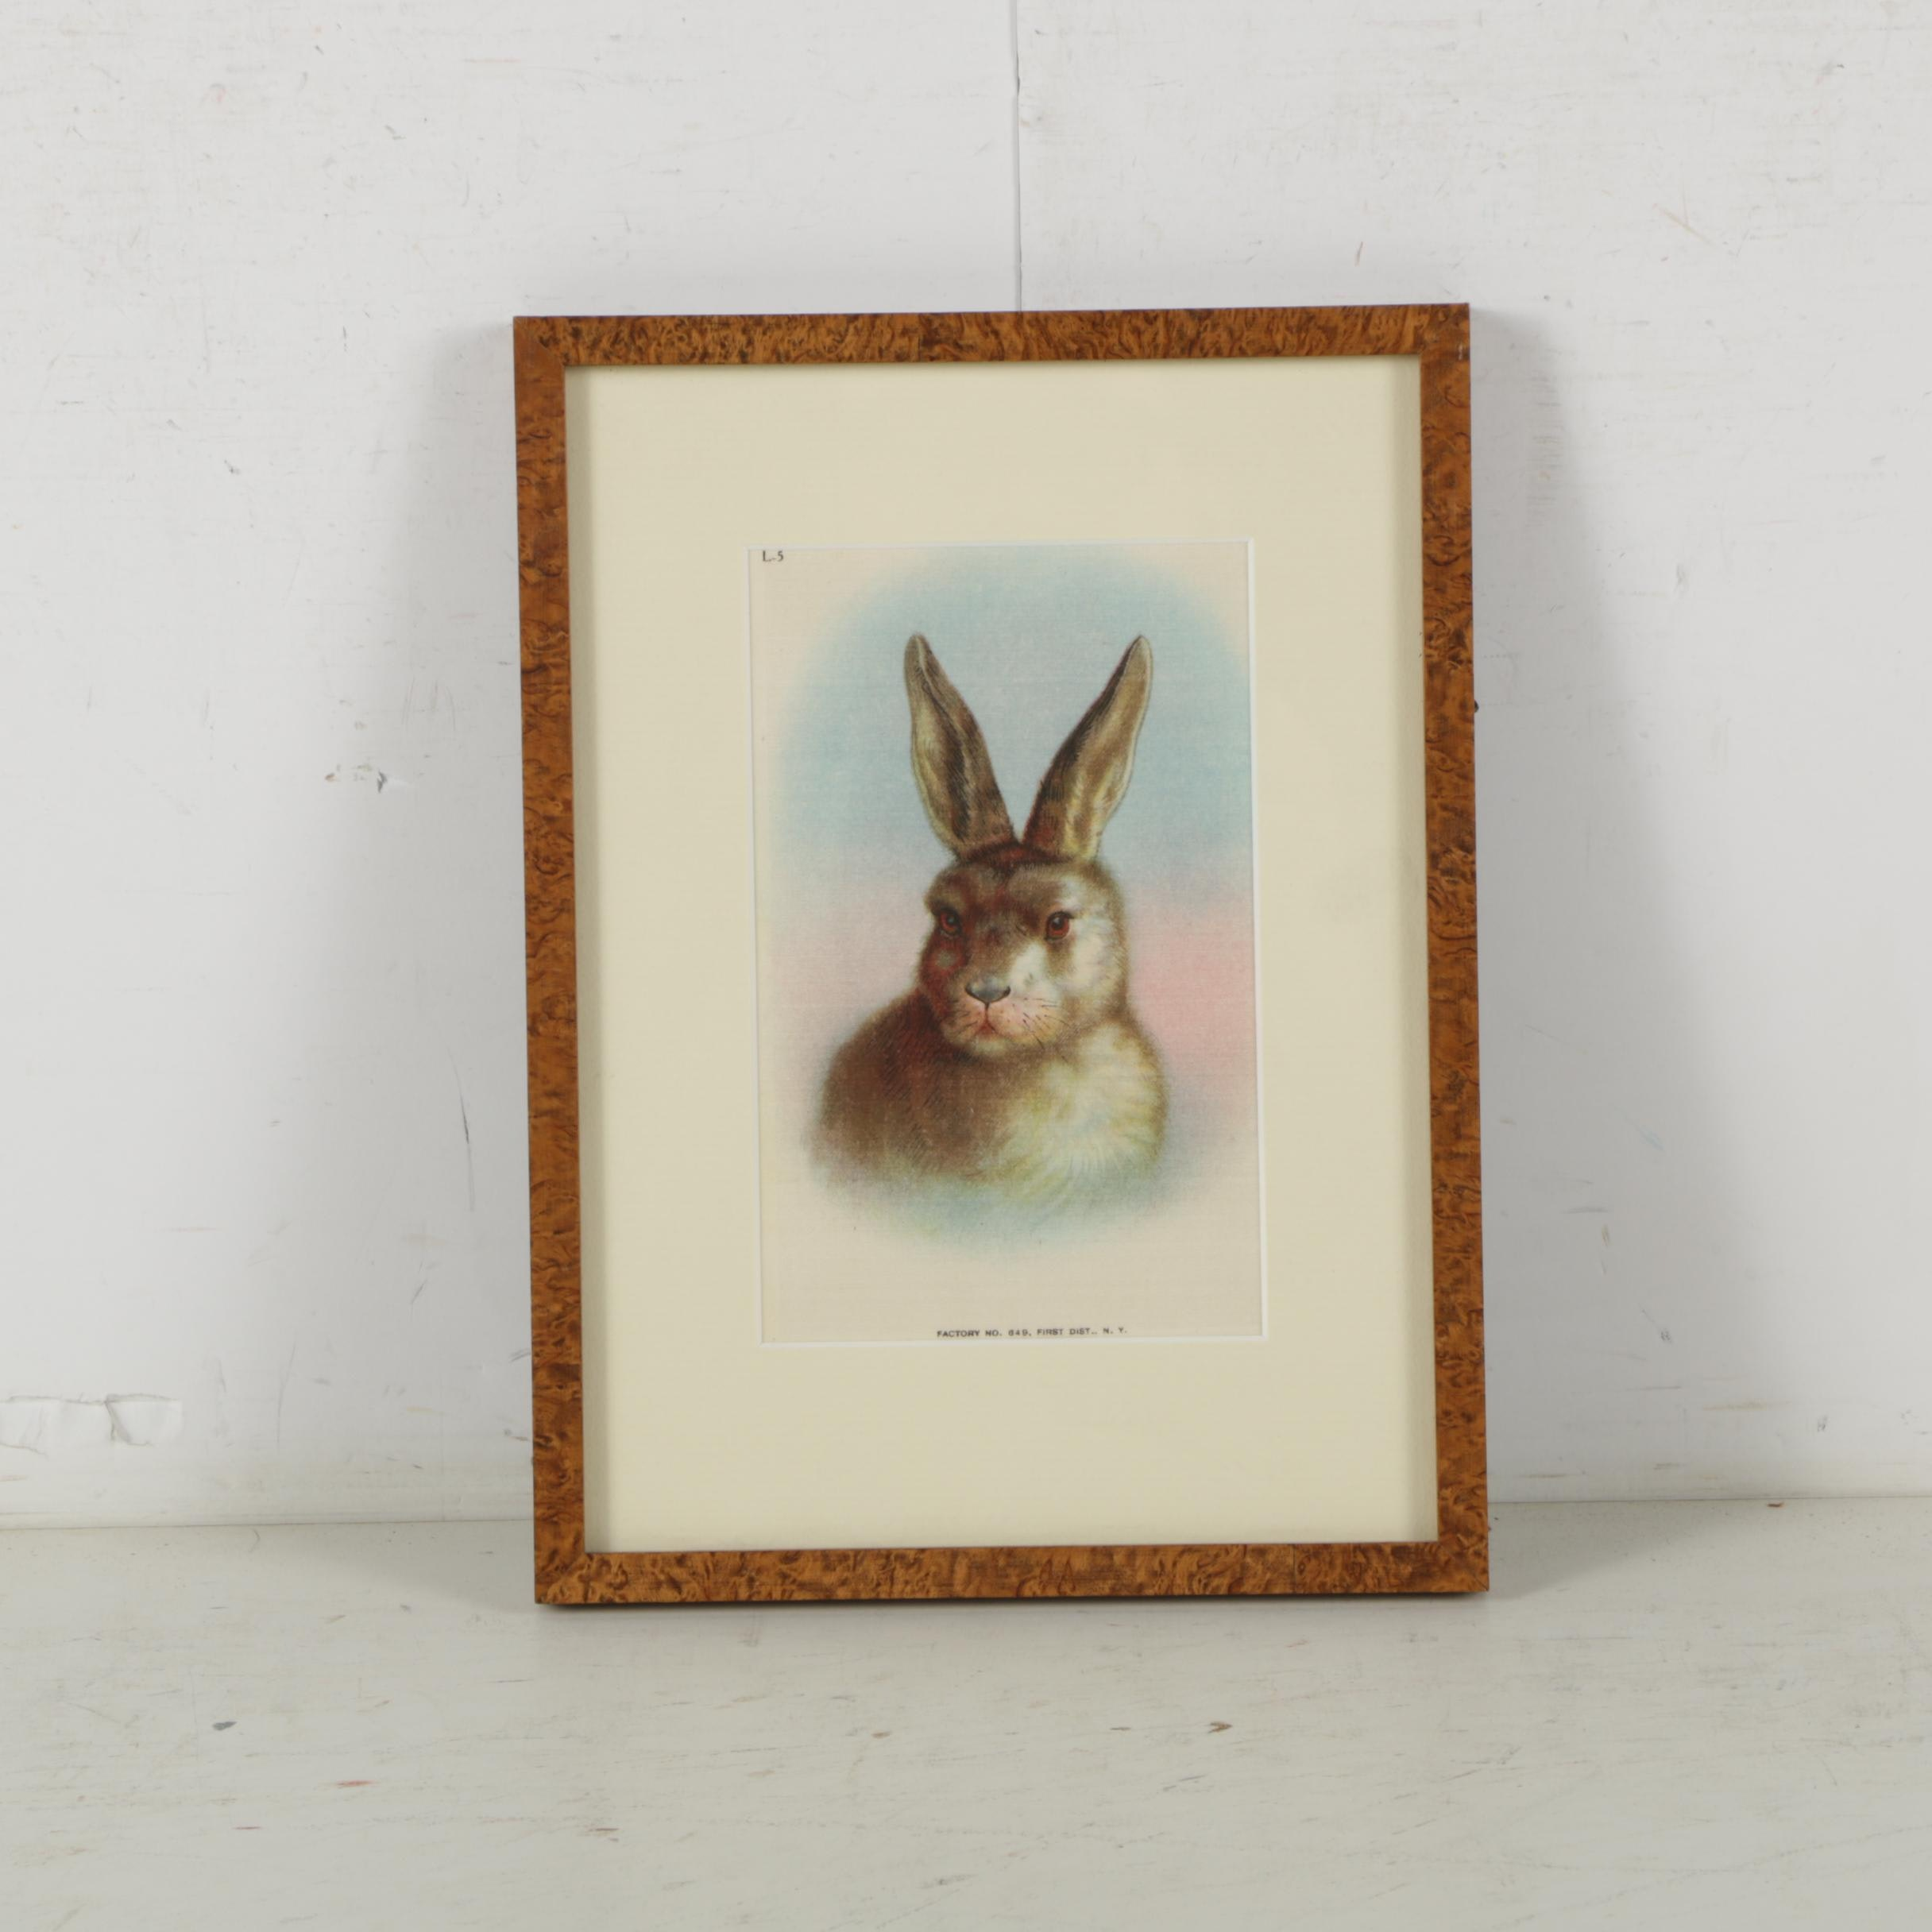 Factory No. 649 Tobacco Silk Illustration of Rabbit